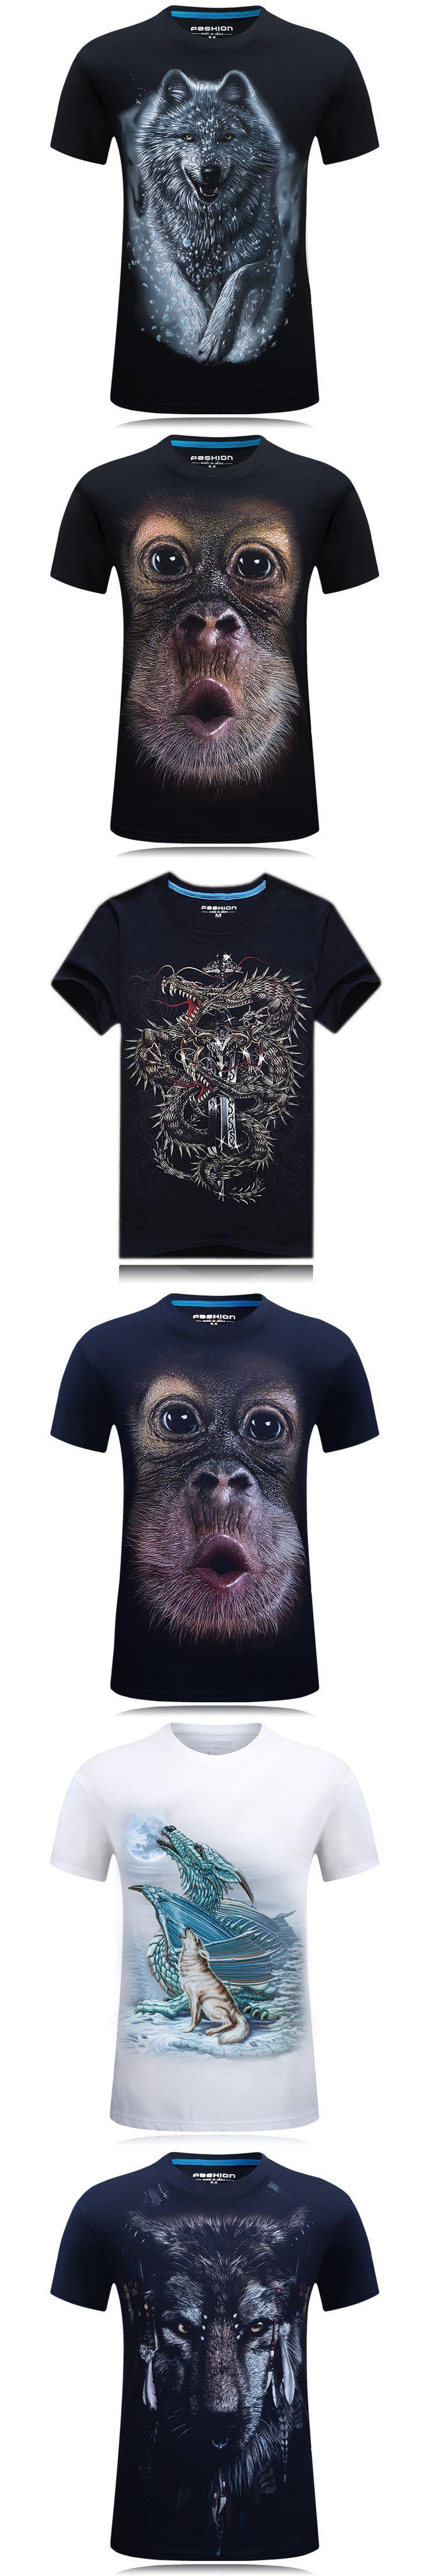 2017 Cotton Summer Men Tshirt Breathable Male Hipster Tee Short Sleeve Hip Hop Orangutan Animal Printing Cool T shirts YN10057